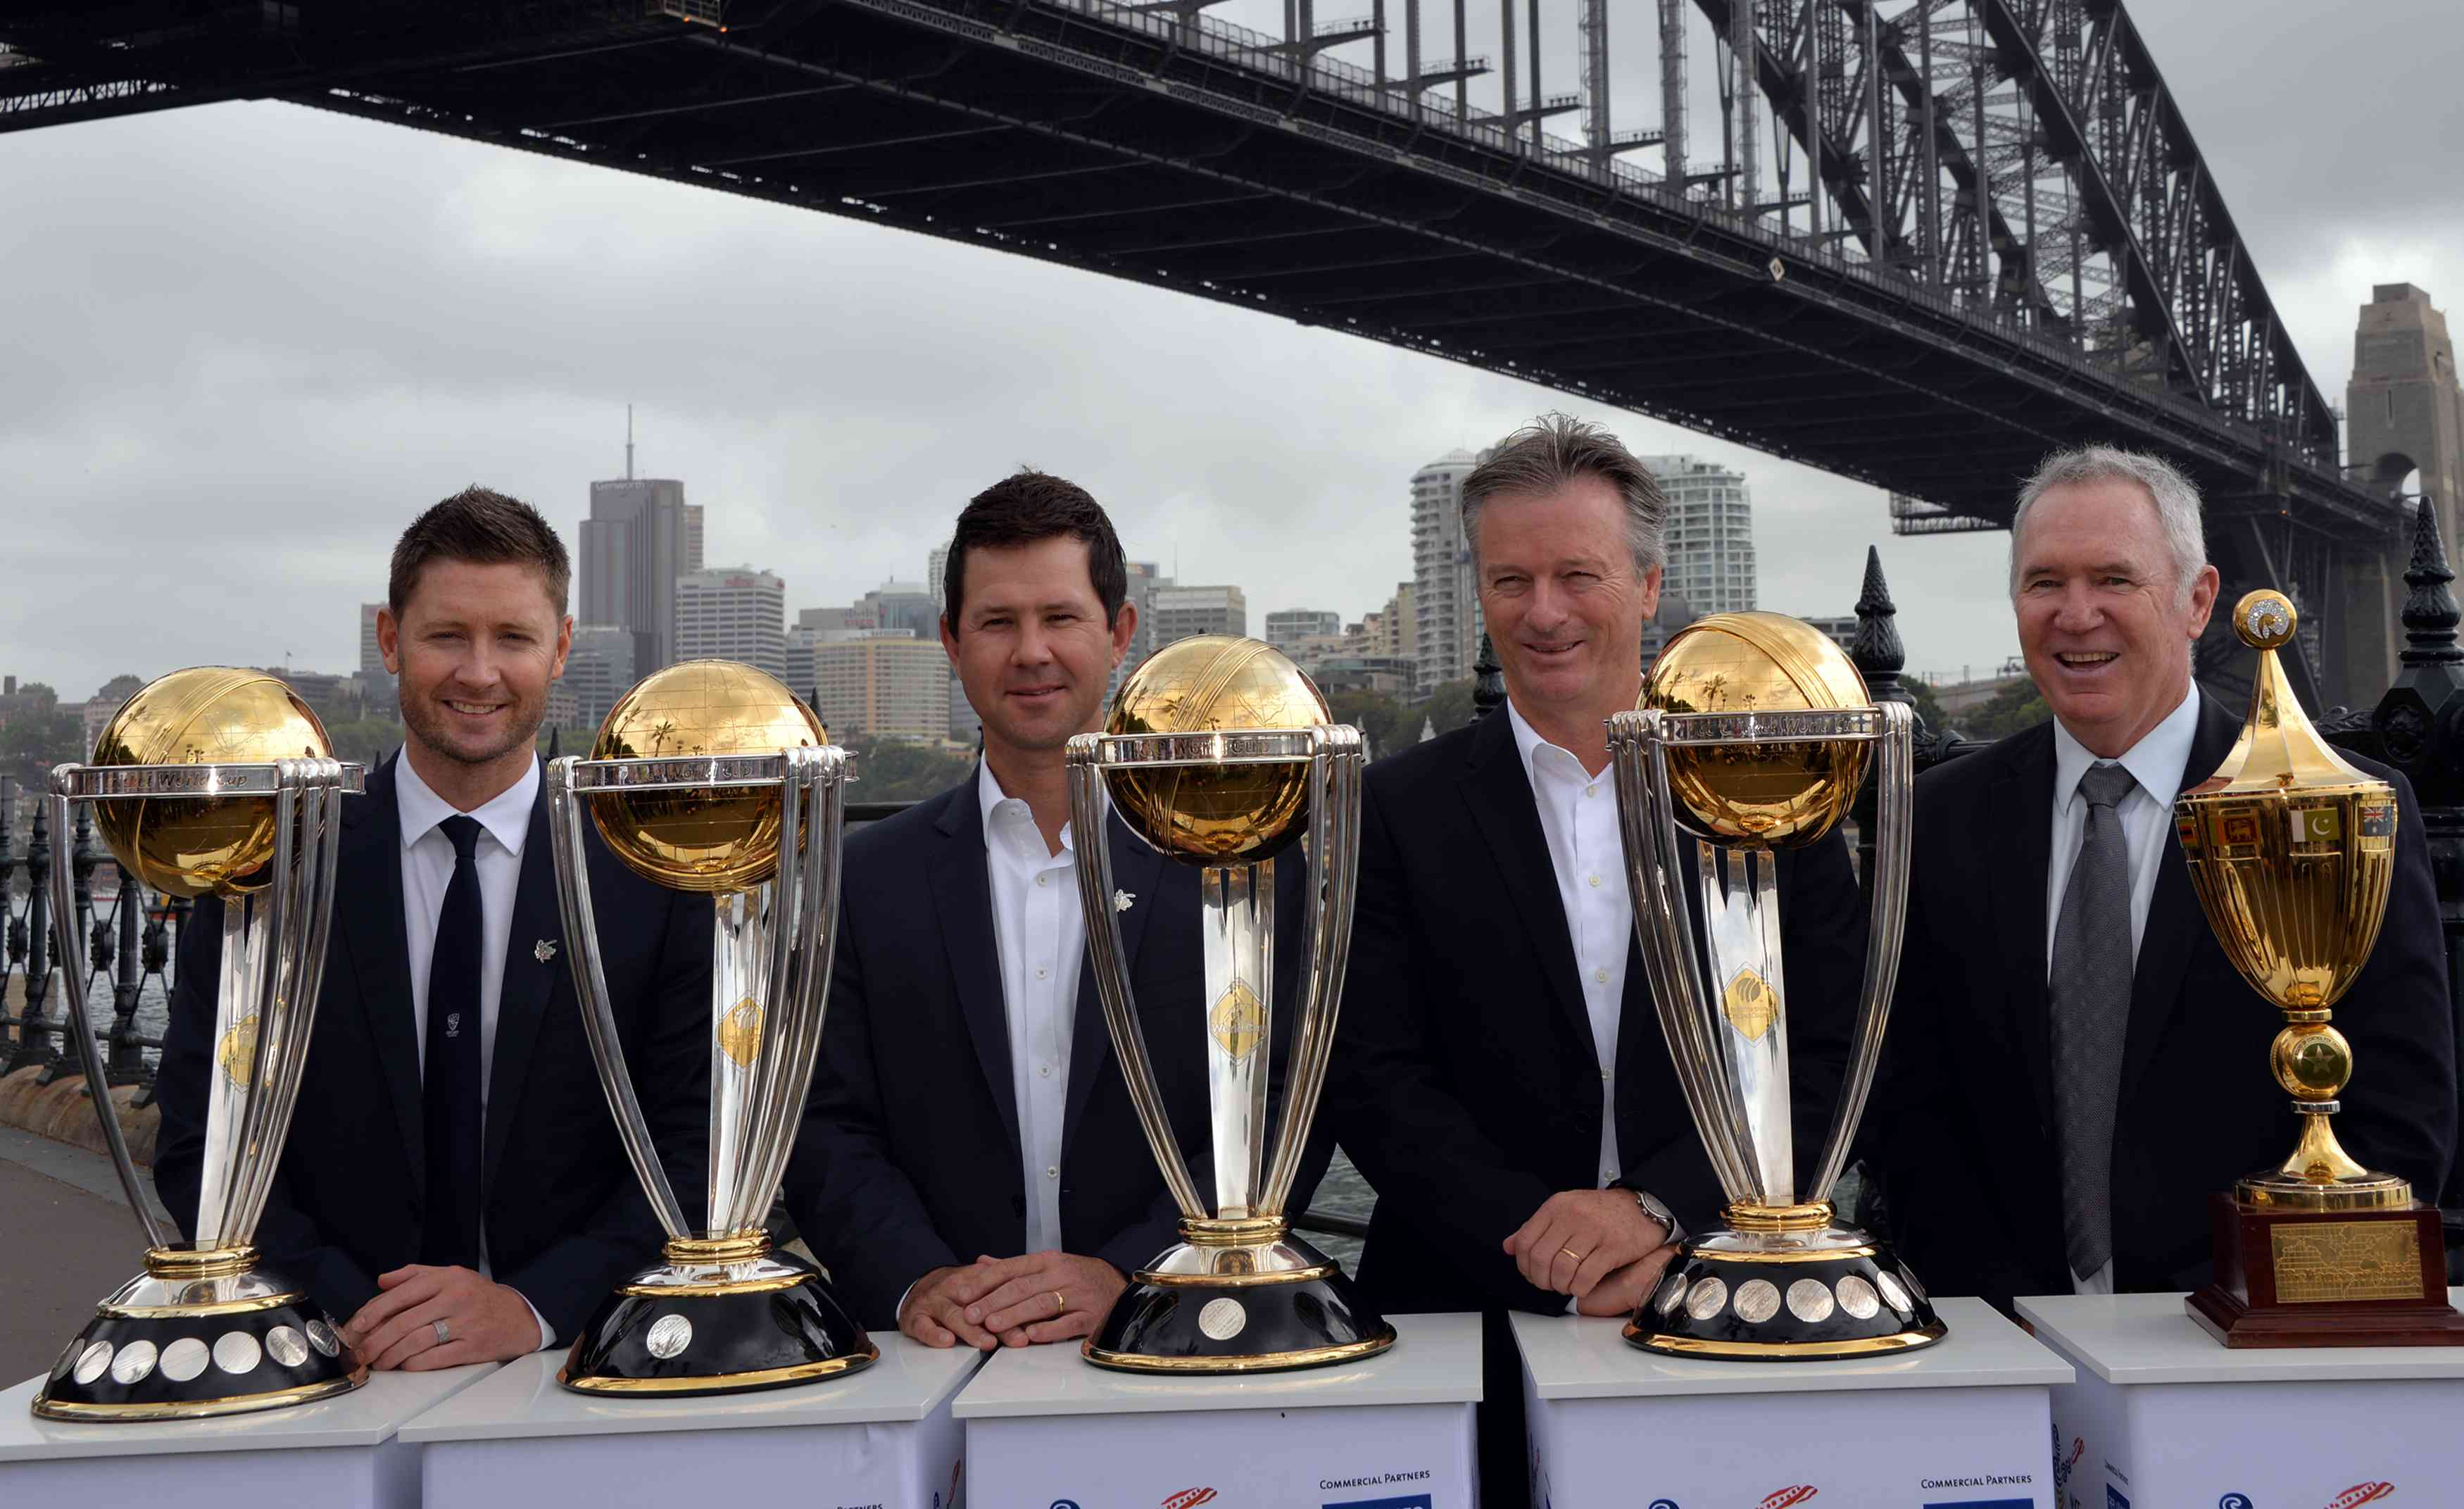 L - R] Australia's World Cup-winning captains – Michael Clarke, Ricky Ponting, Steve Waugh and Alan Border [AFP / Saeed Khan]